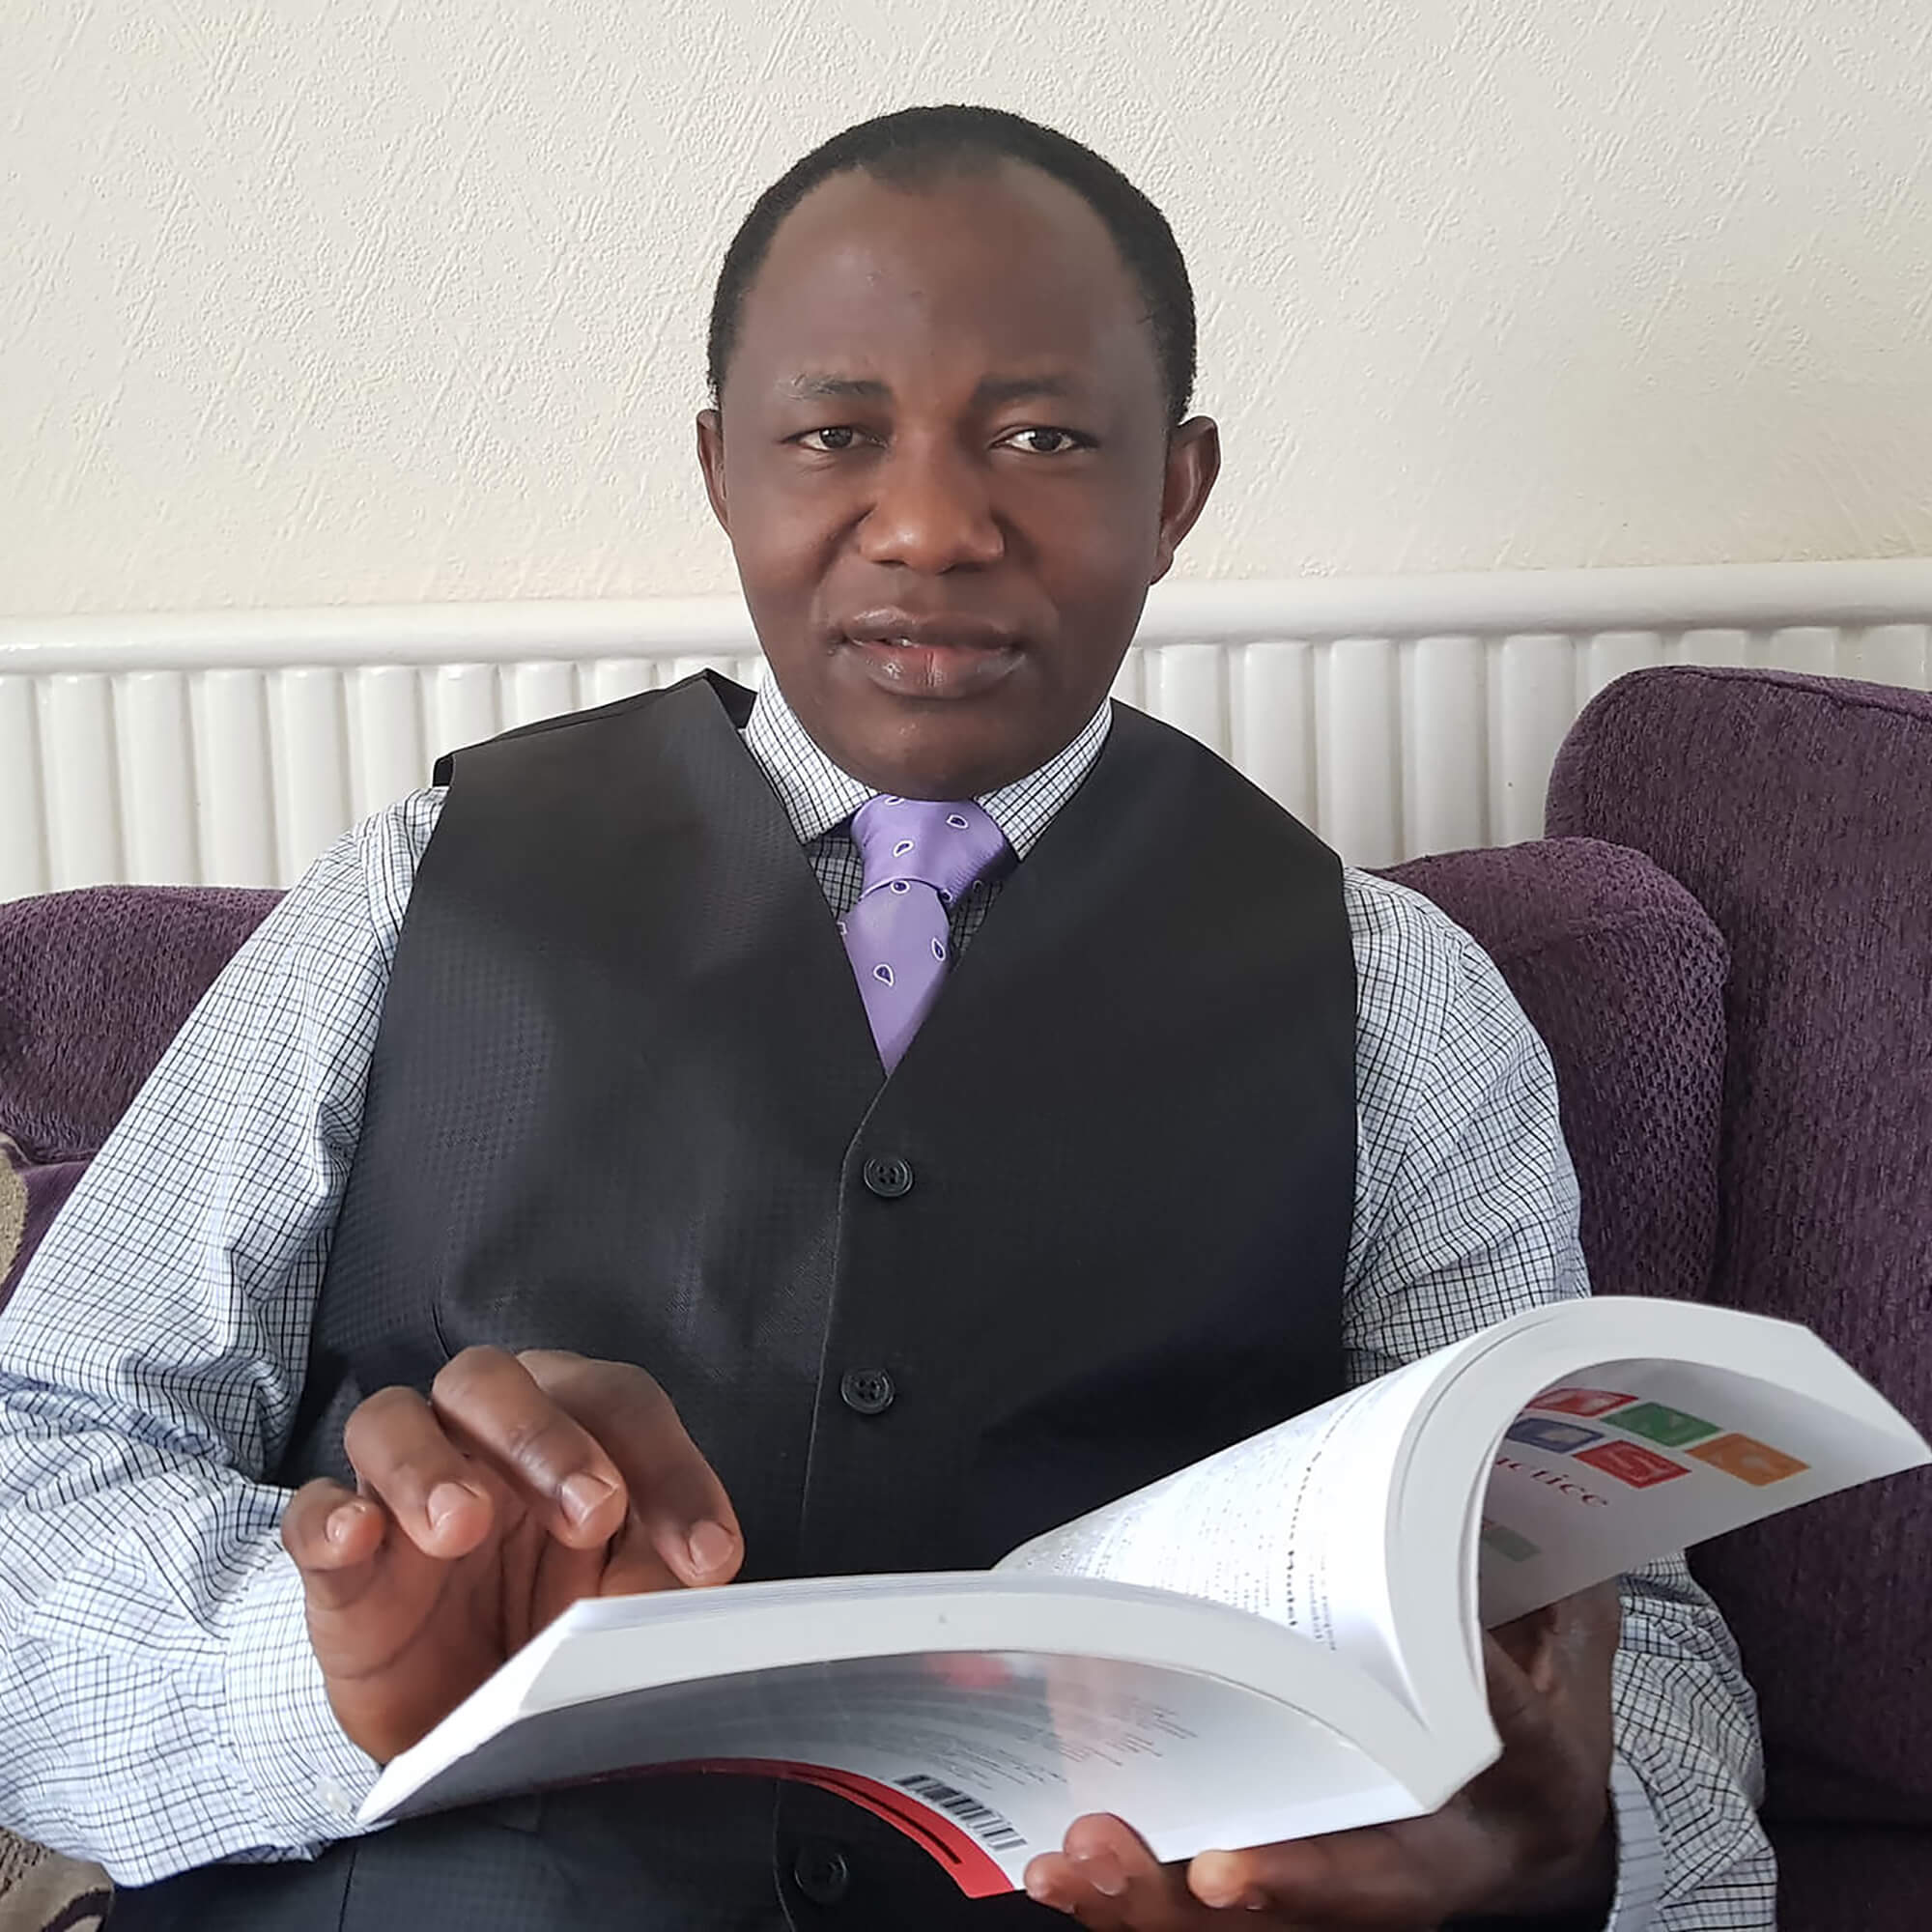 Stephen Sadiku sat reading a book